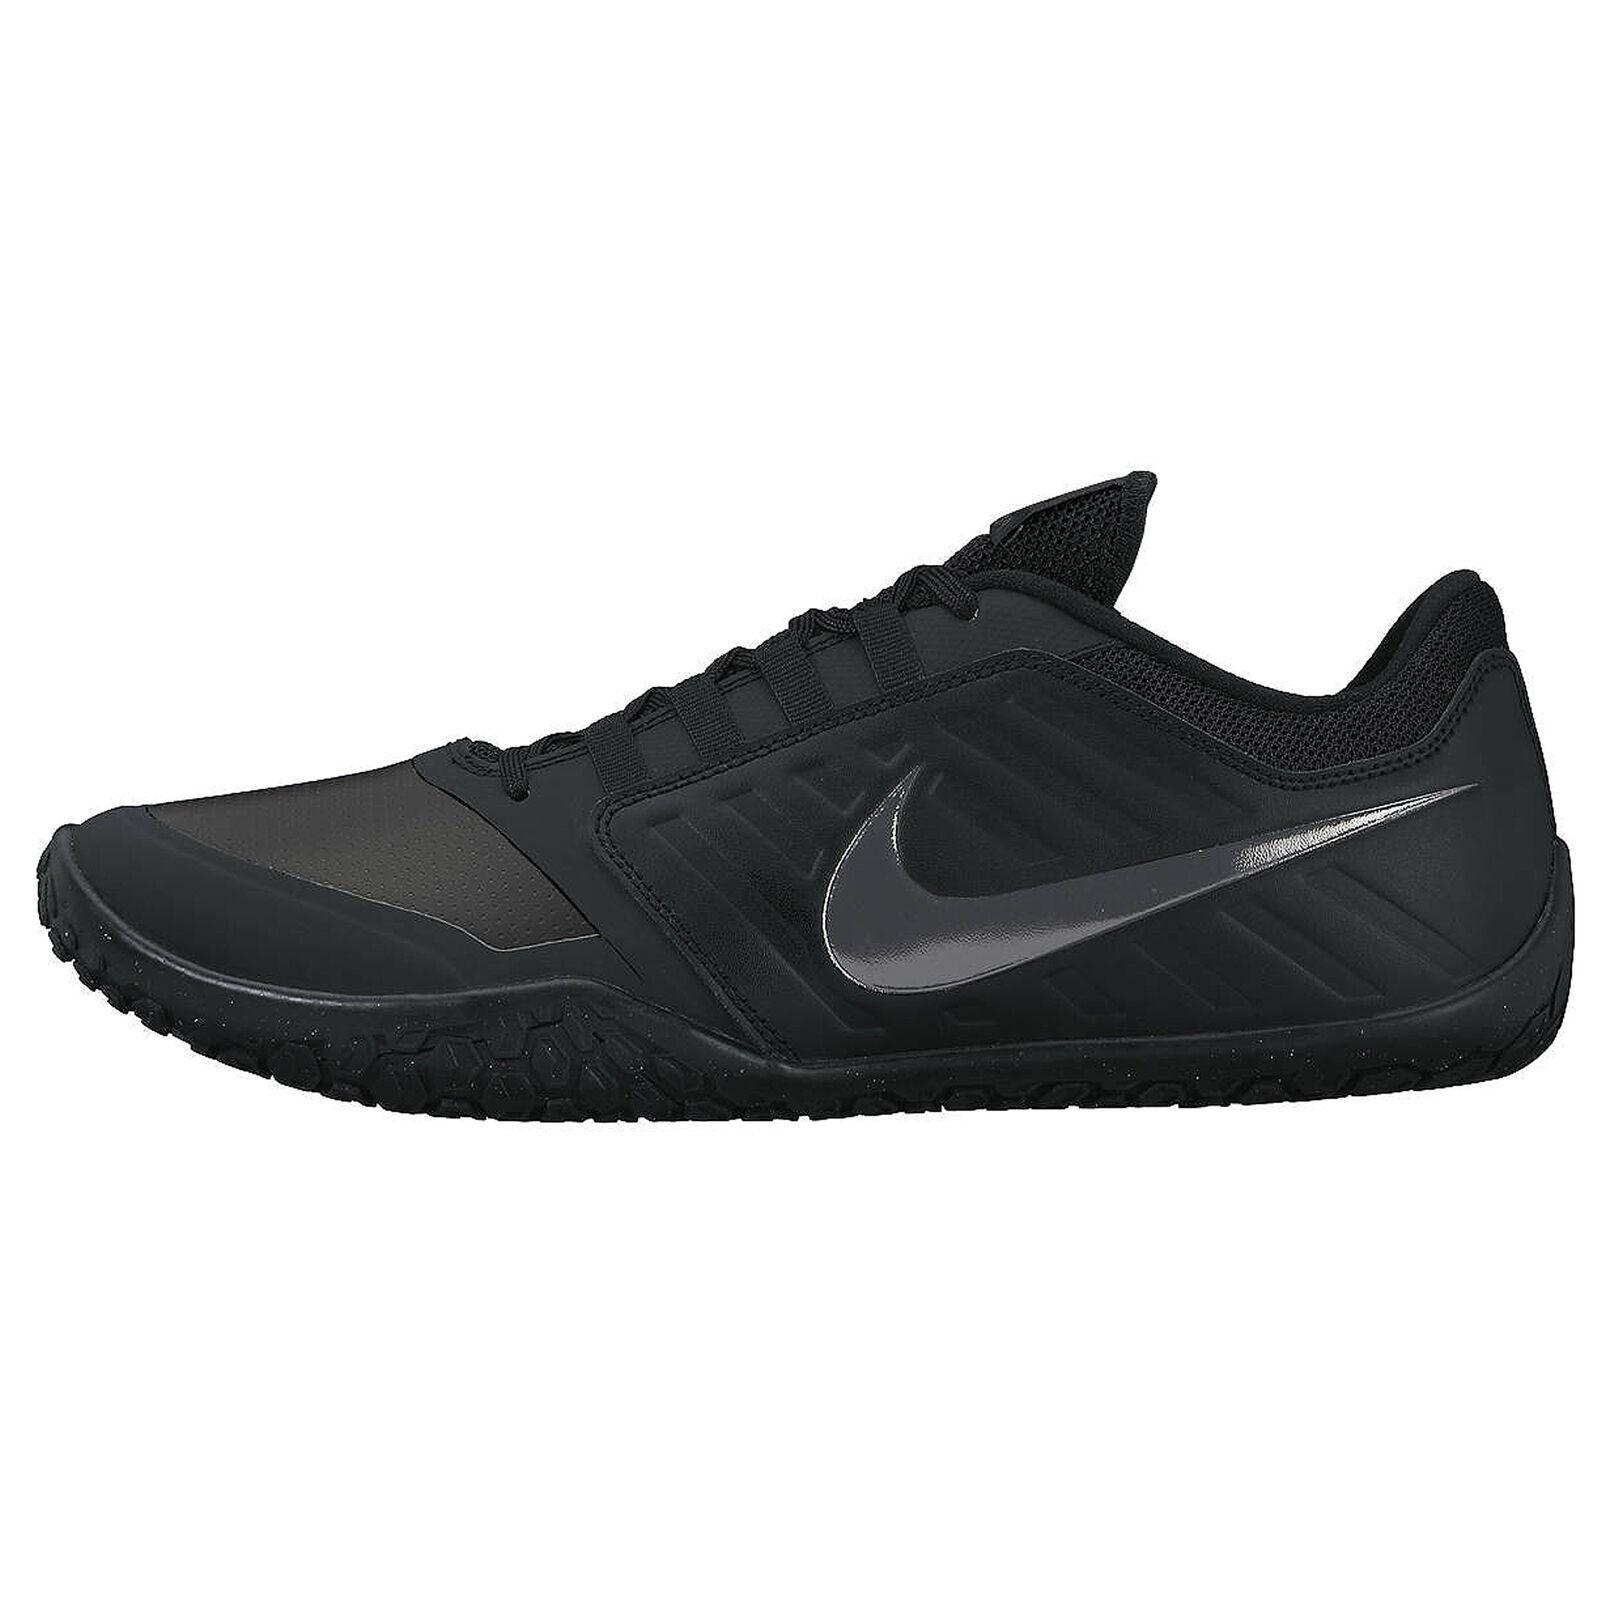 NIKE AIR ODYSSEY LX Nike Air Pernix SCARPE scarpe scarpe scarpe da ginnastica MAX Scarpe da corsa NUOVO 2a1552